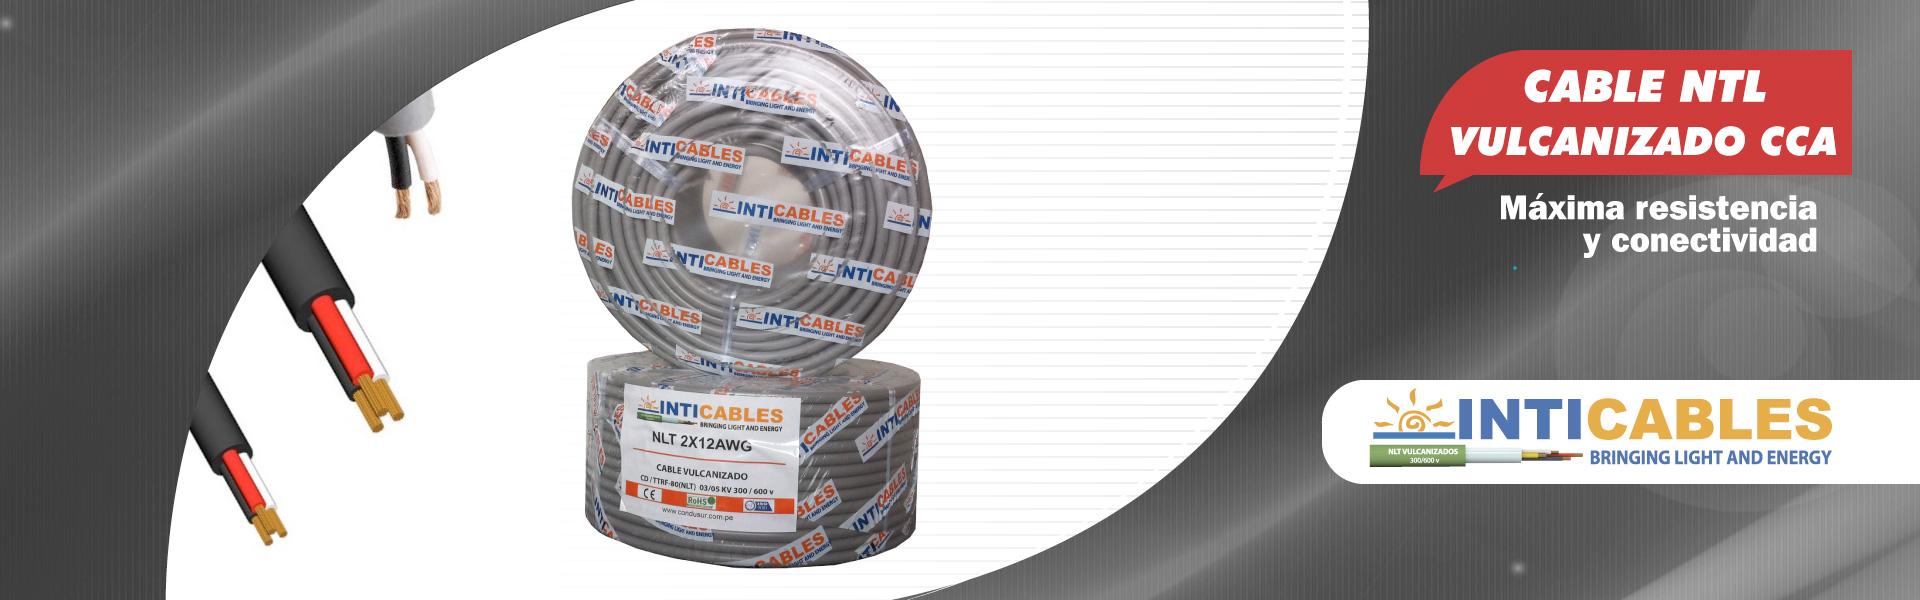 cable-vulcanizado-inticables1